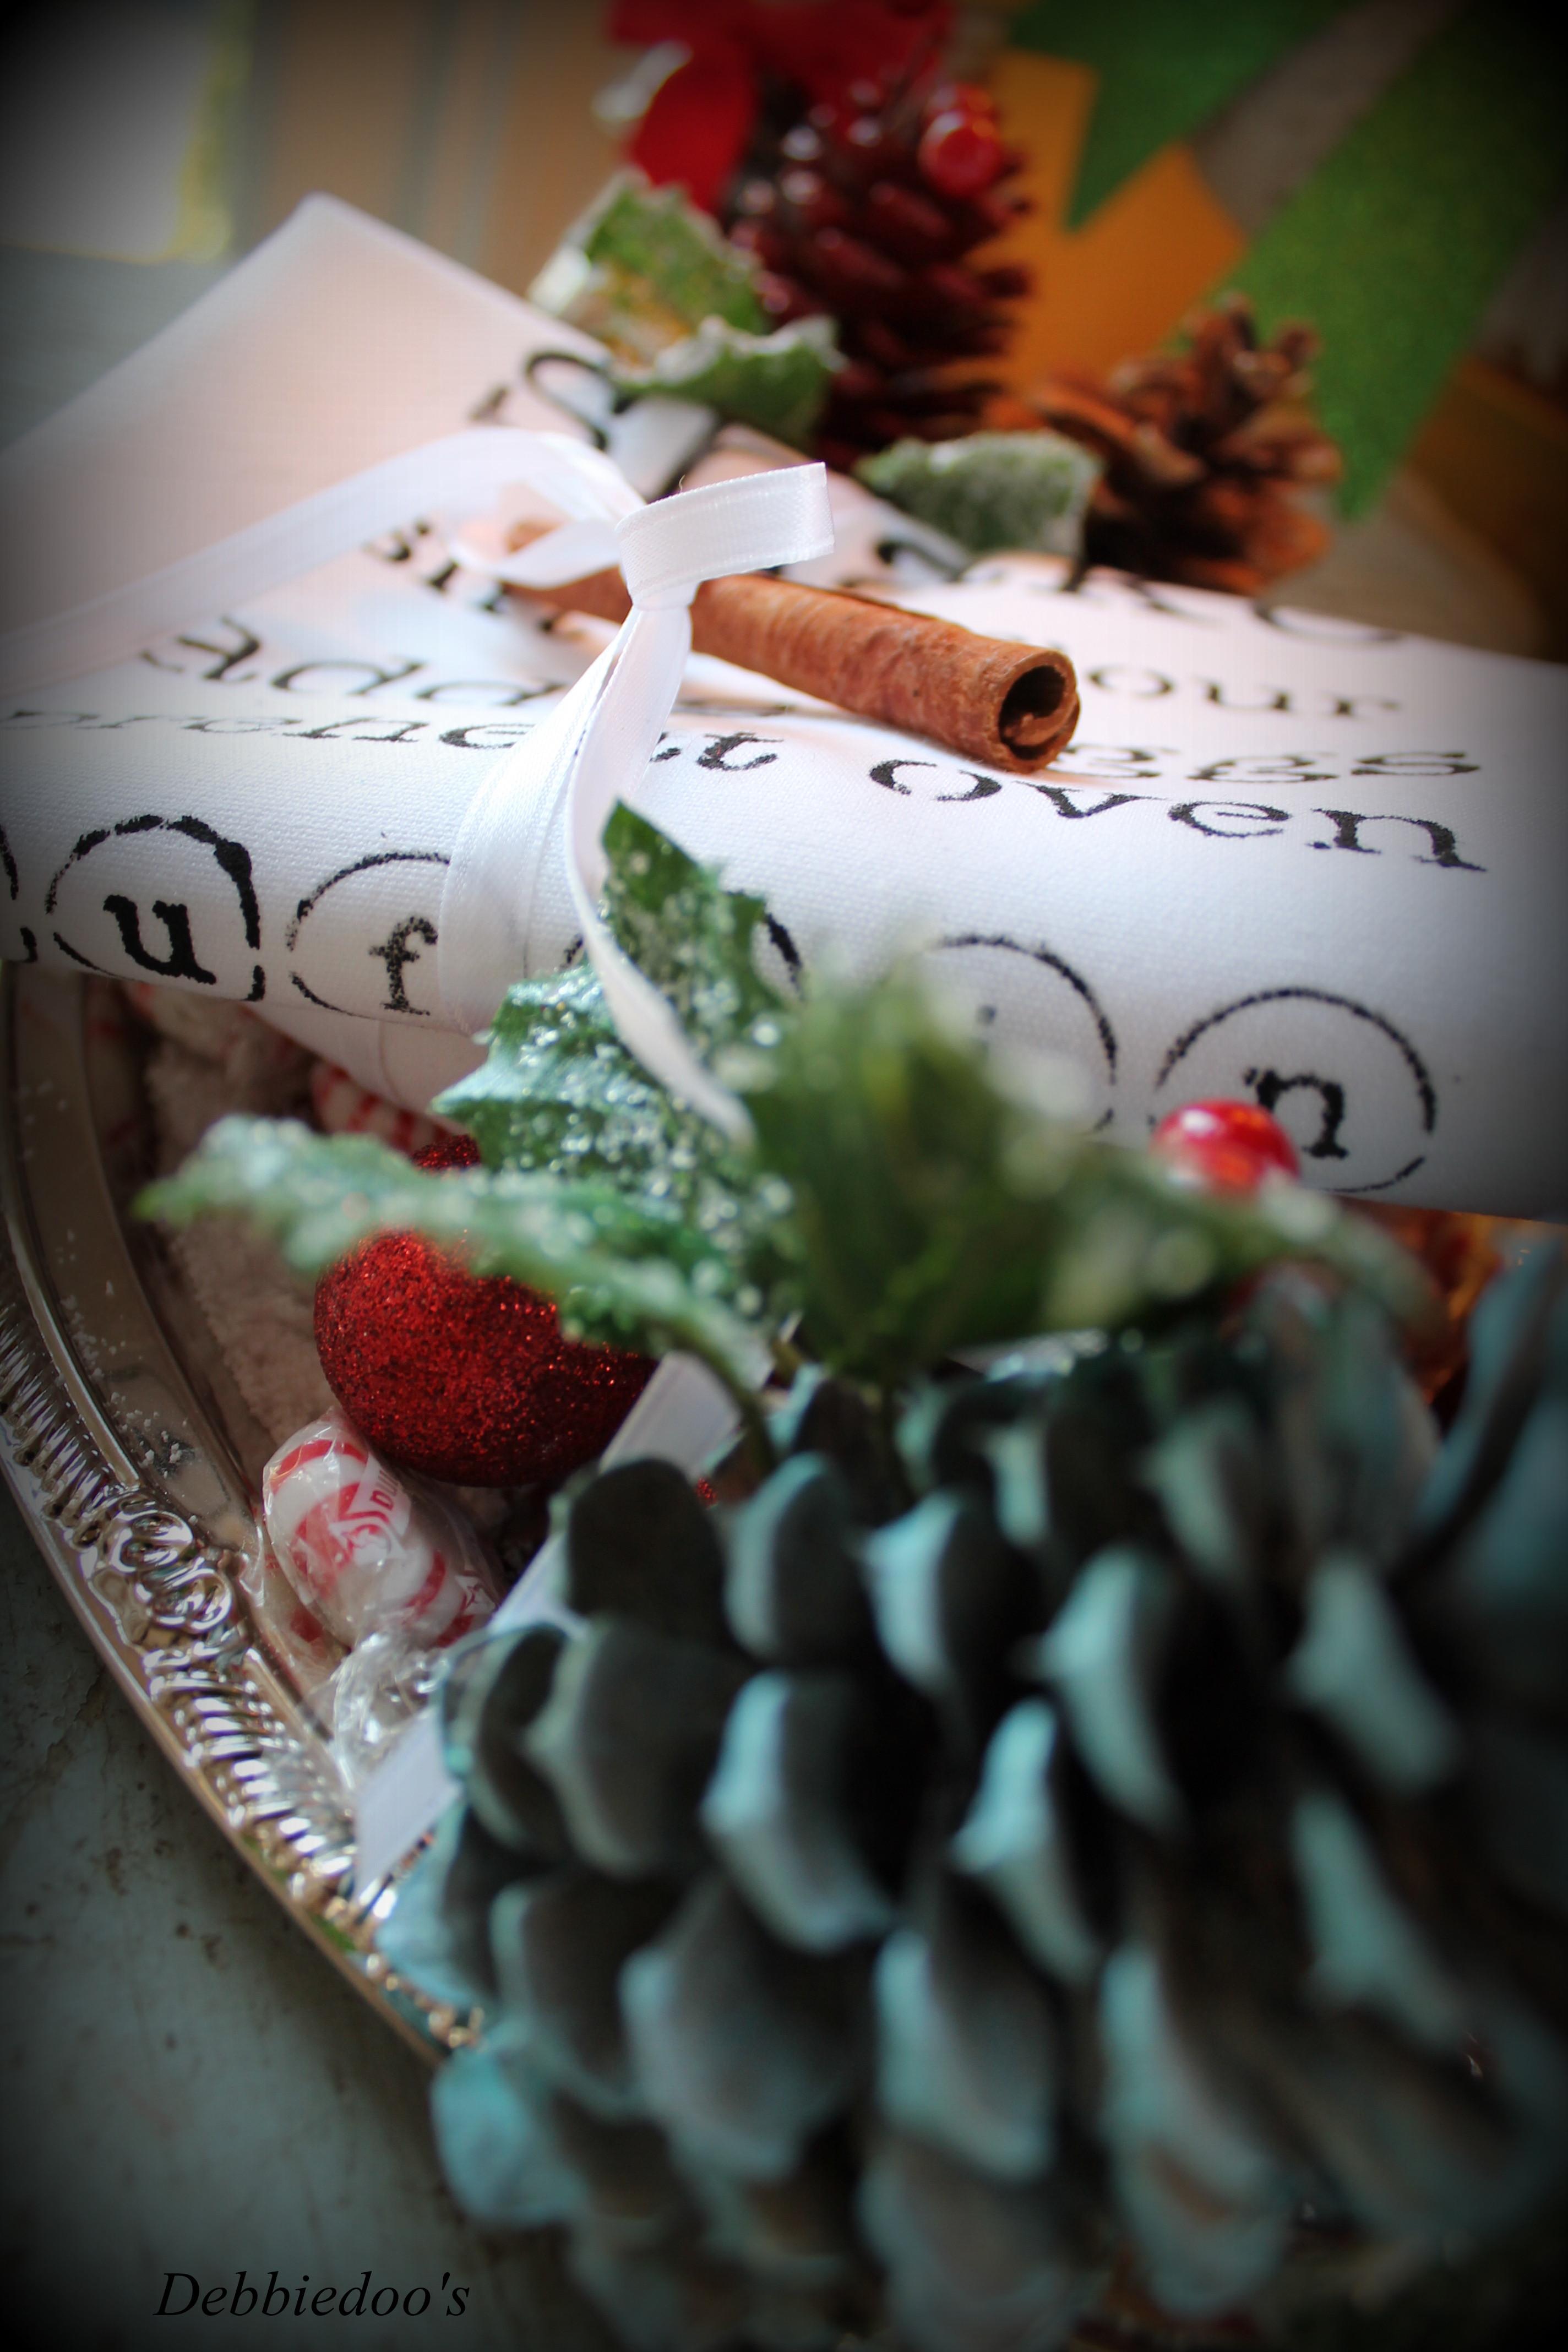 Stenciled tea towel for Christmas gift idea